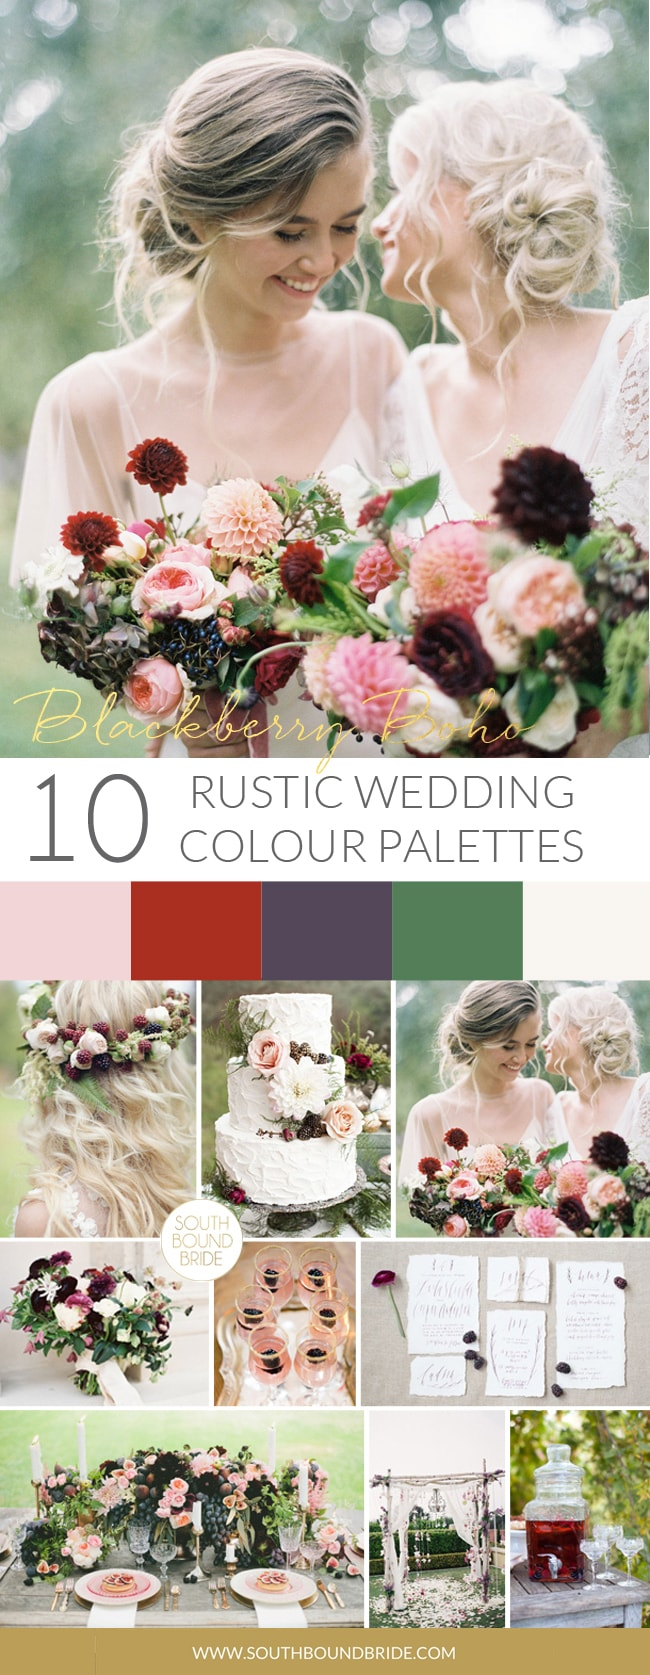 10 Rustic Wedding Color Palettes | SouthBound Bride